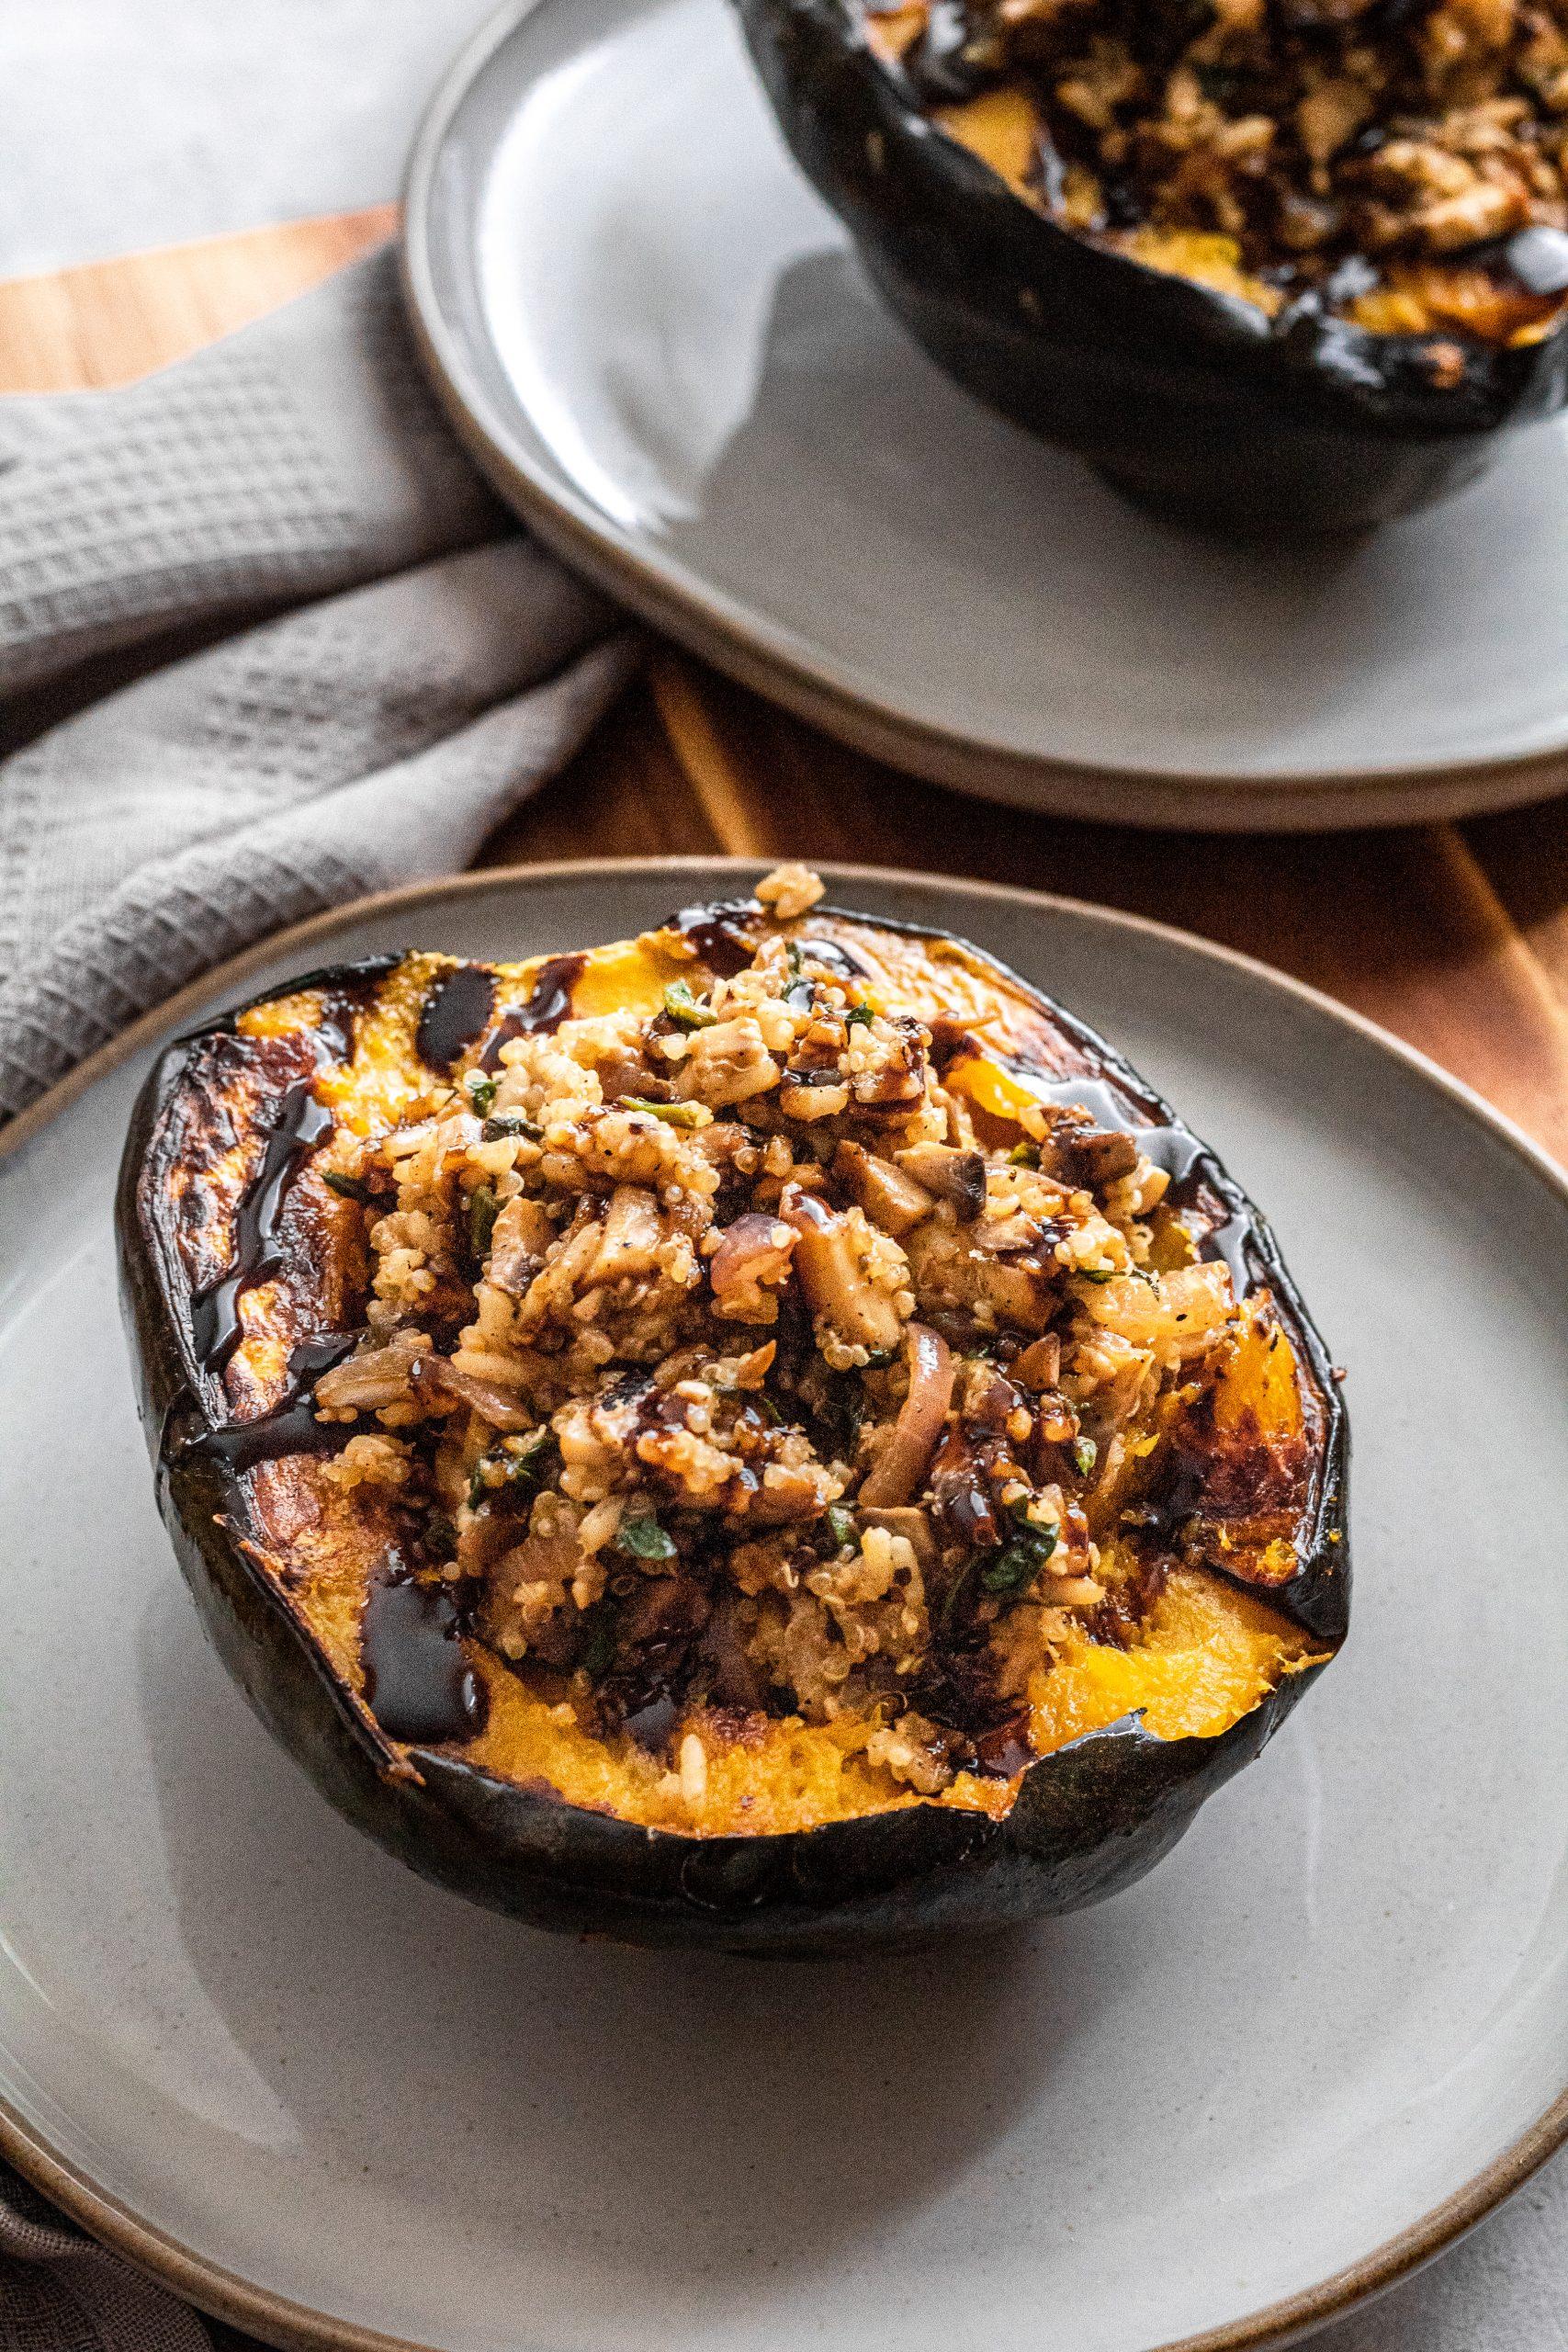 mushroom and quinoa stuffed acorn squash